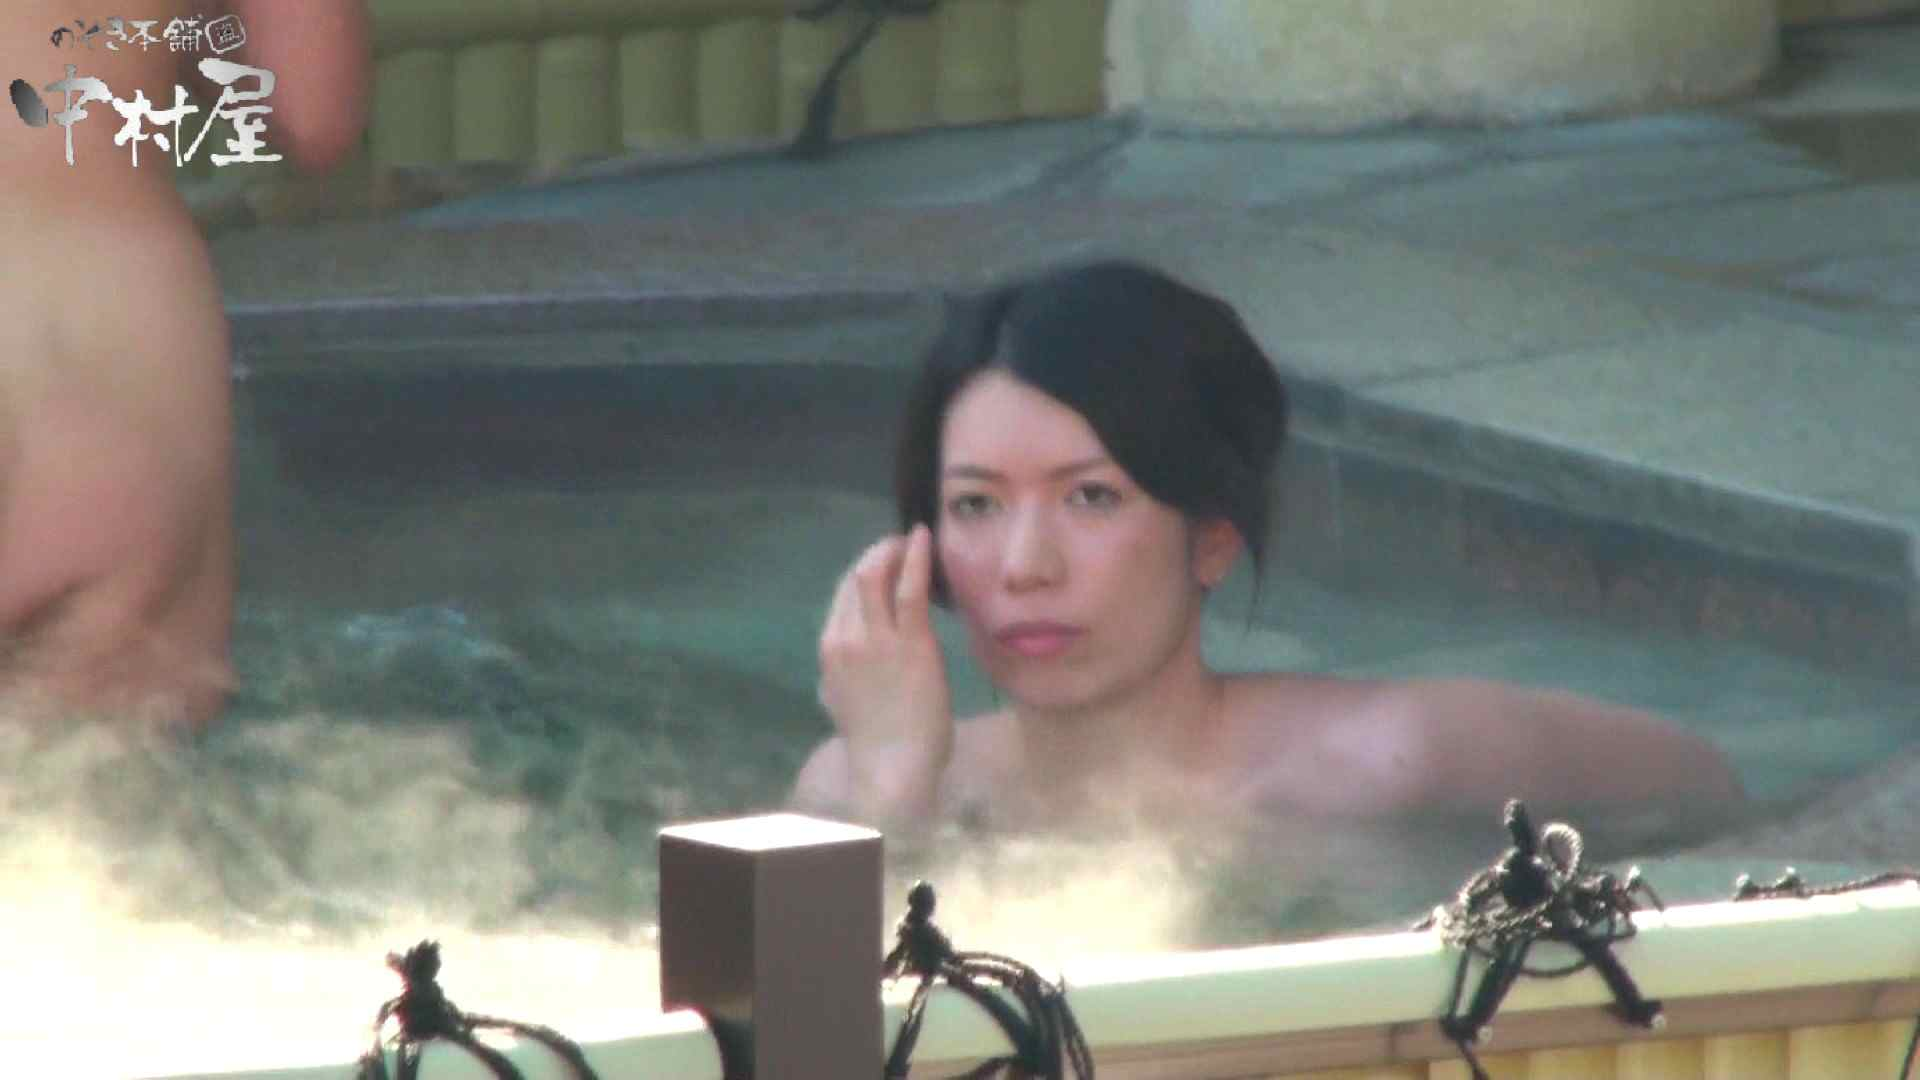 Aquaな露天風呂Vol.919 OLのエロ生活   露天風呂  91連発 67